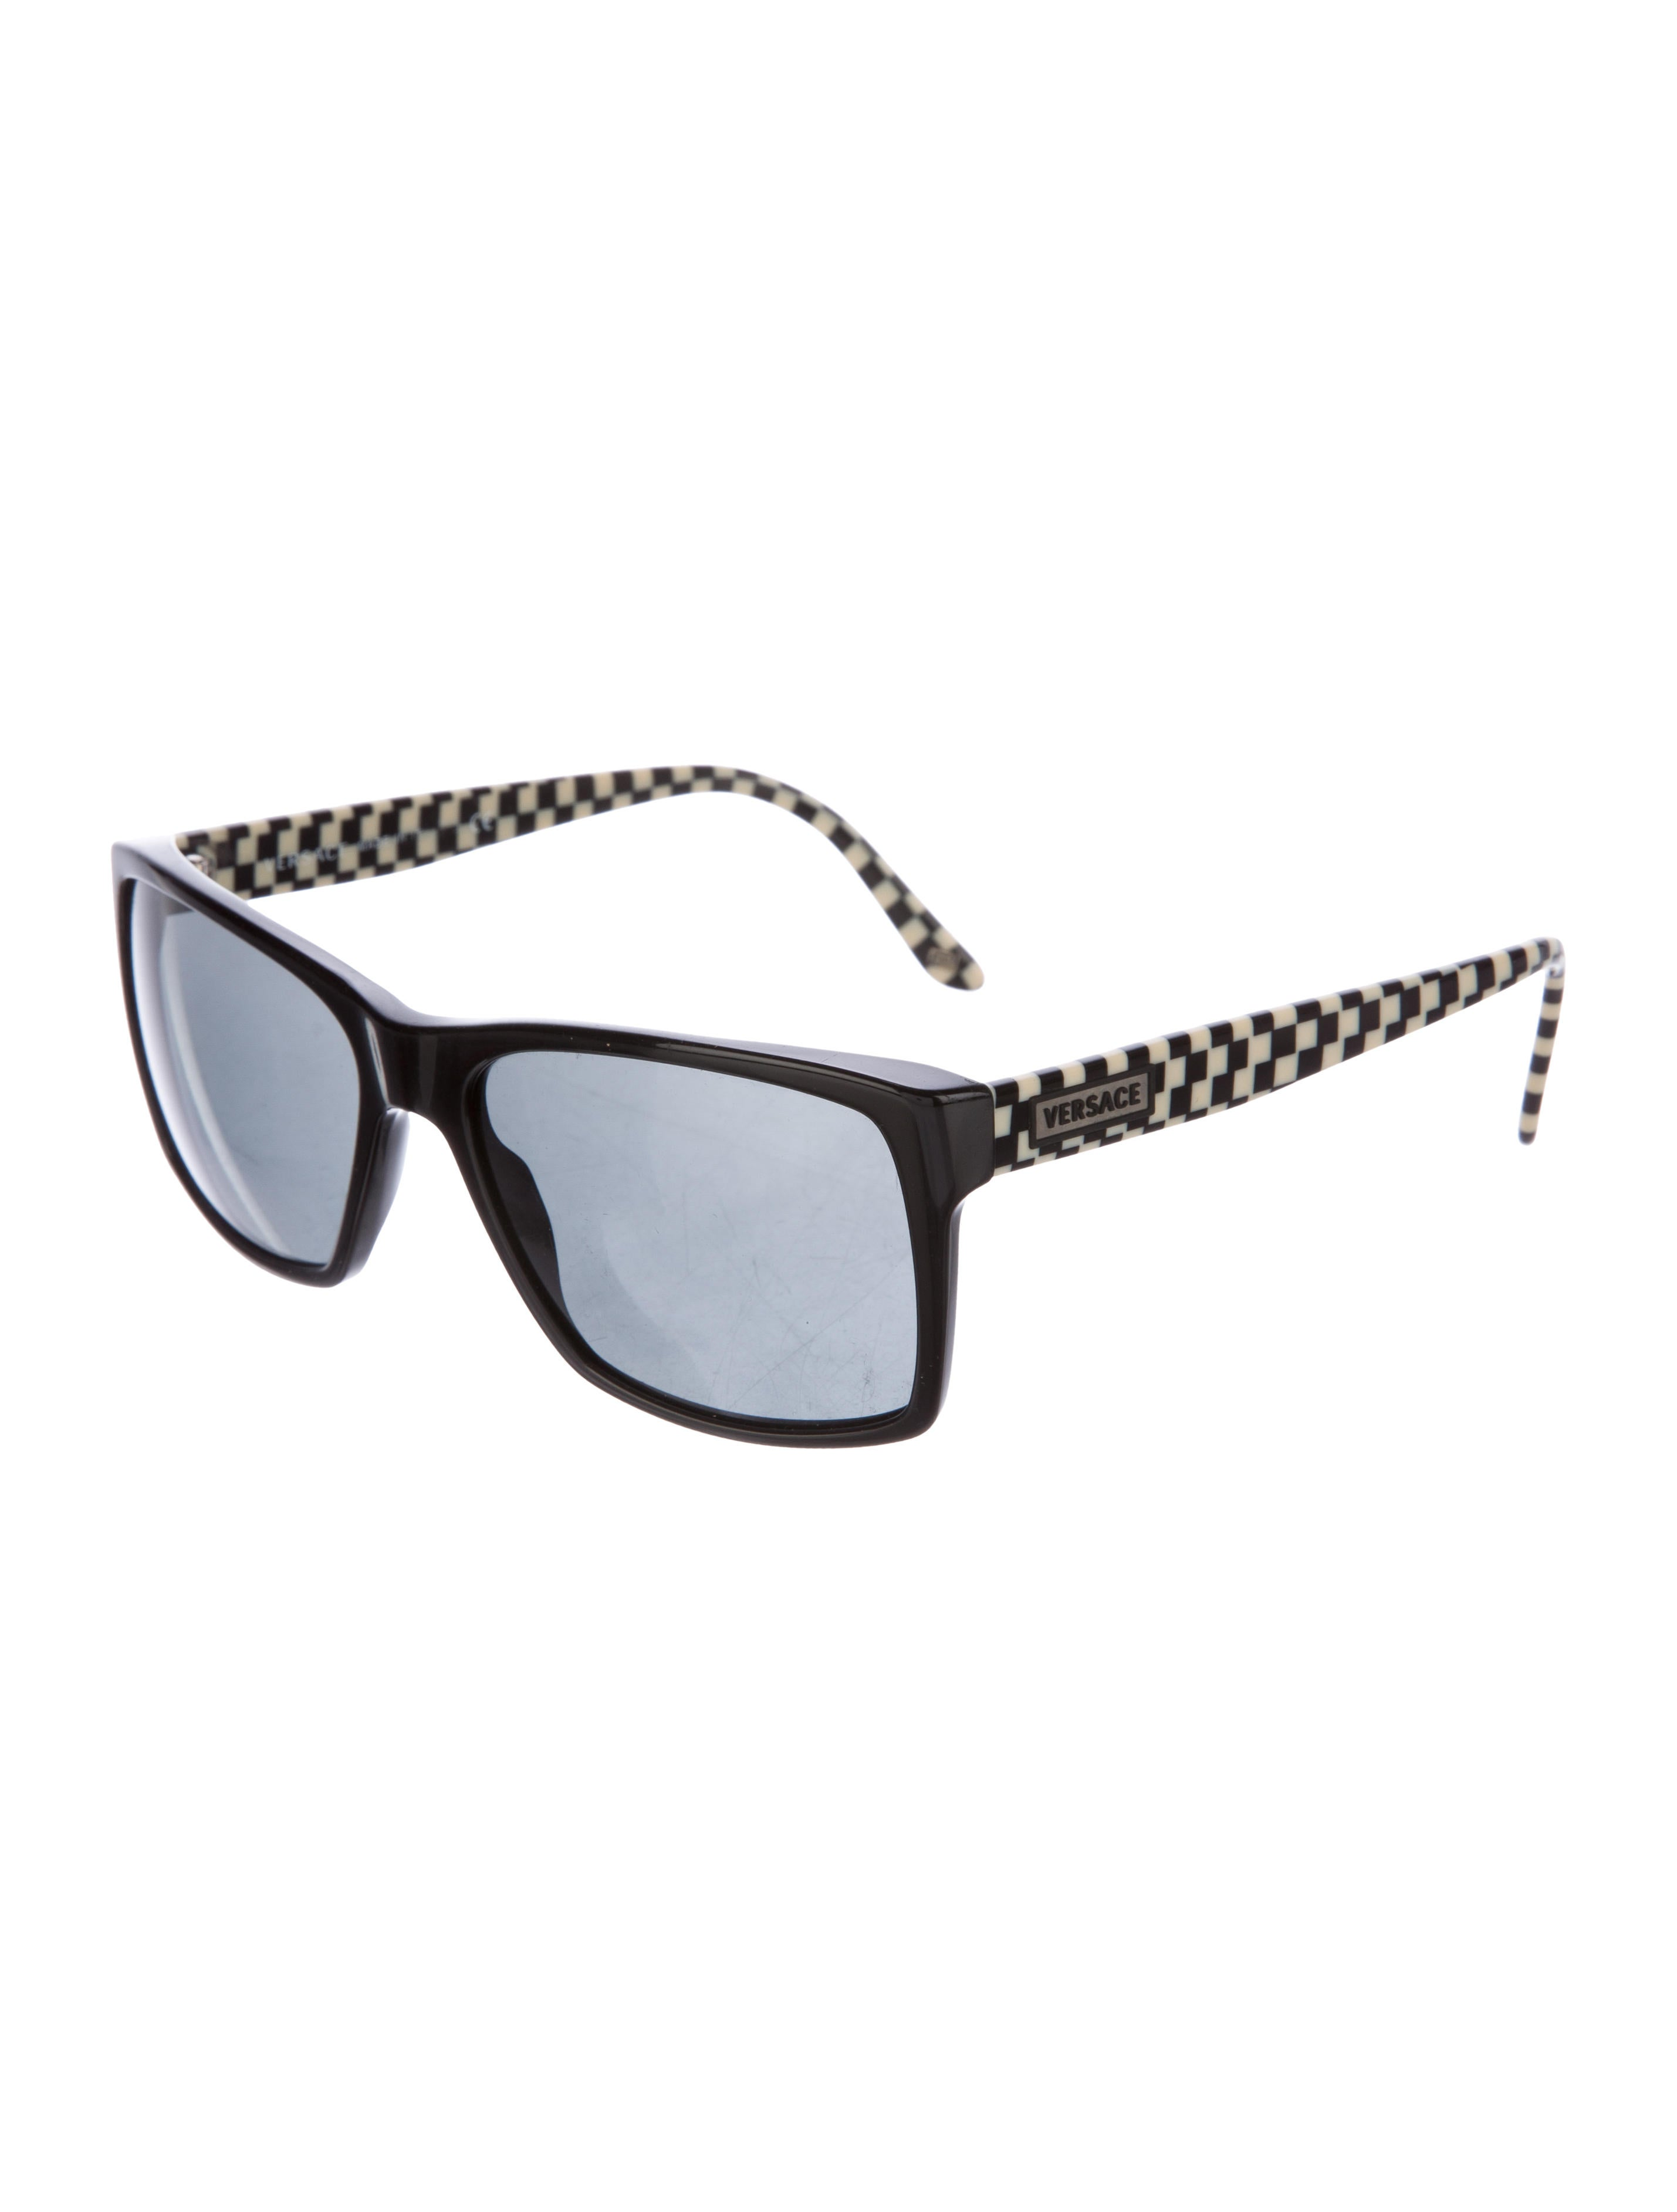 145a1d5f701e Mens White Versace Sunglasses